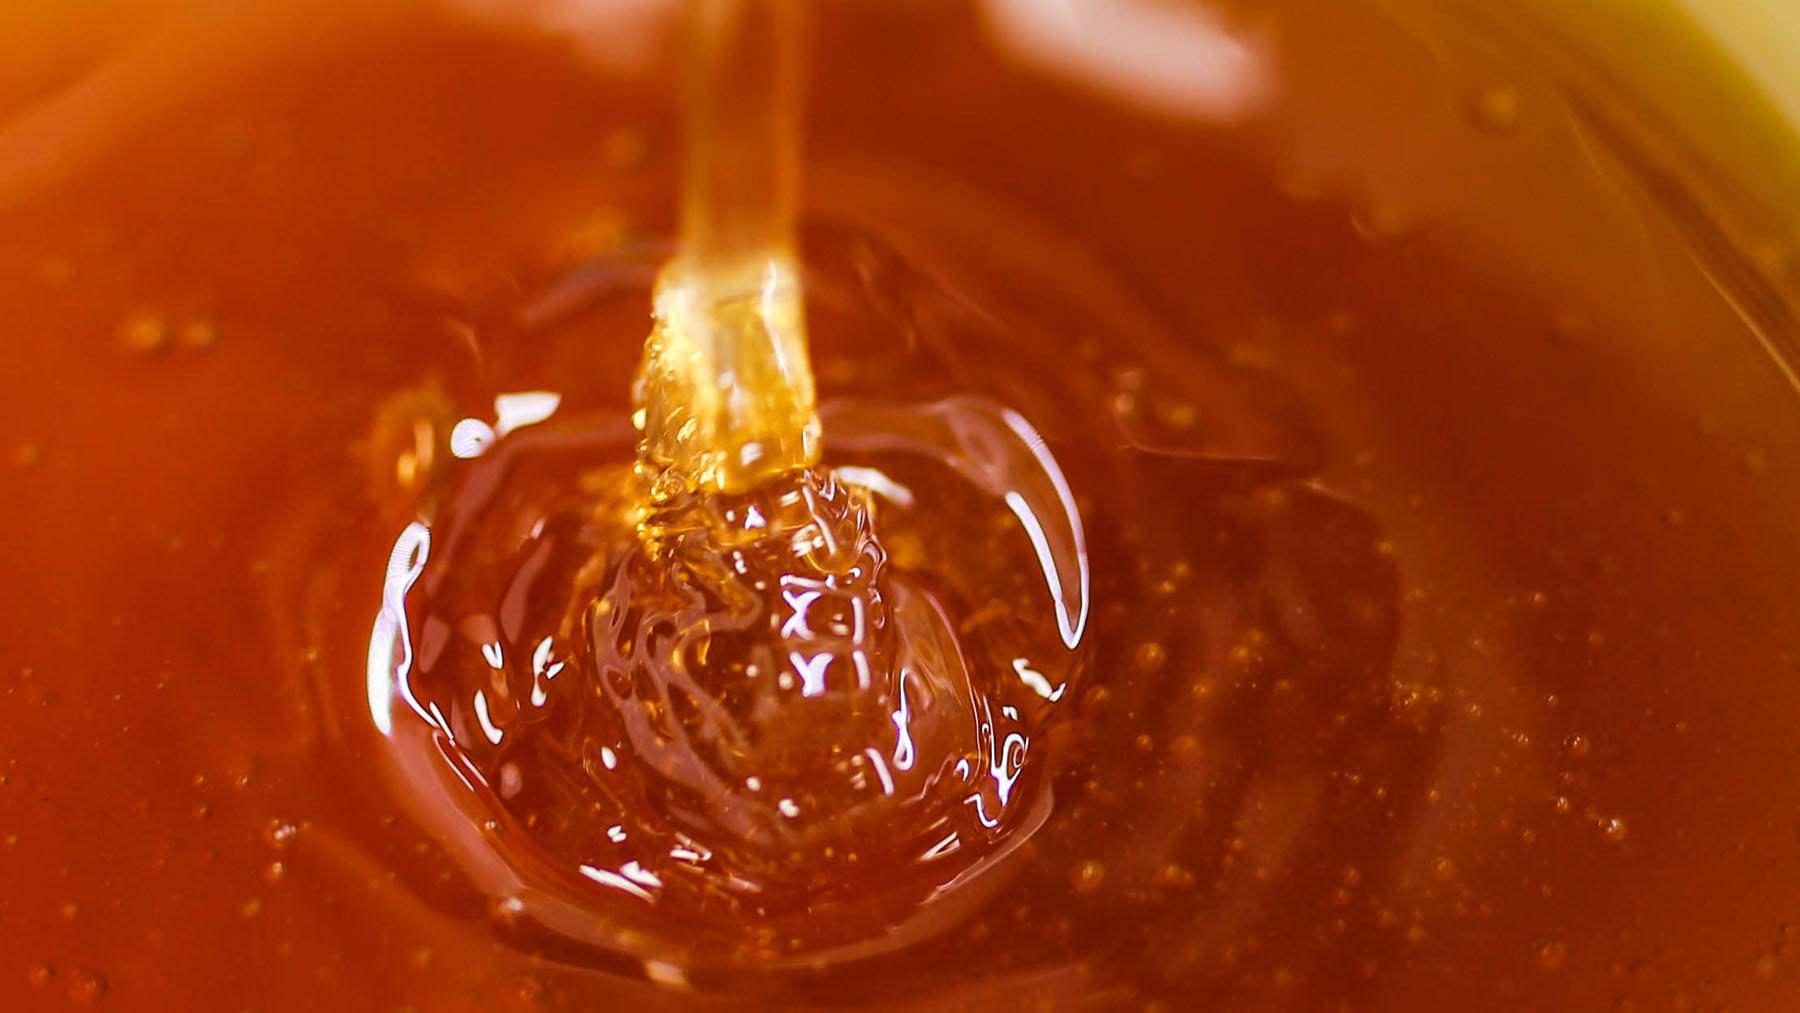 miel honey I washed